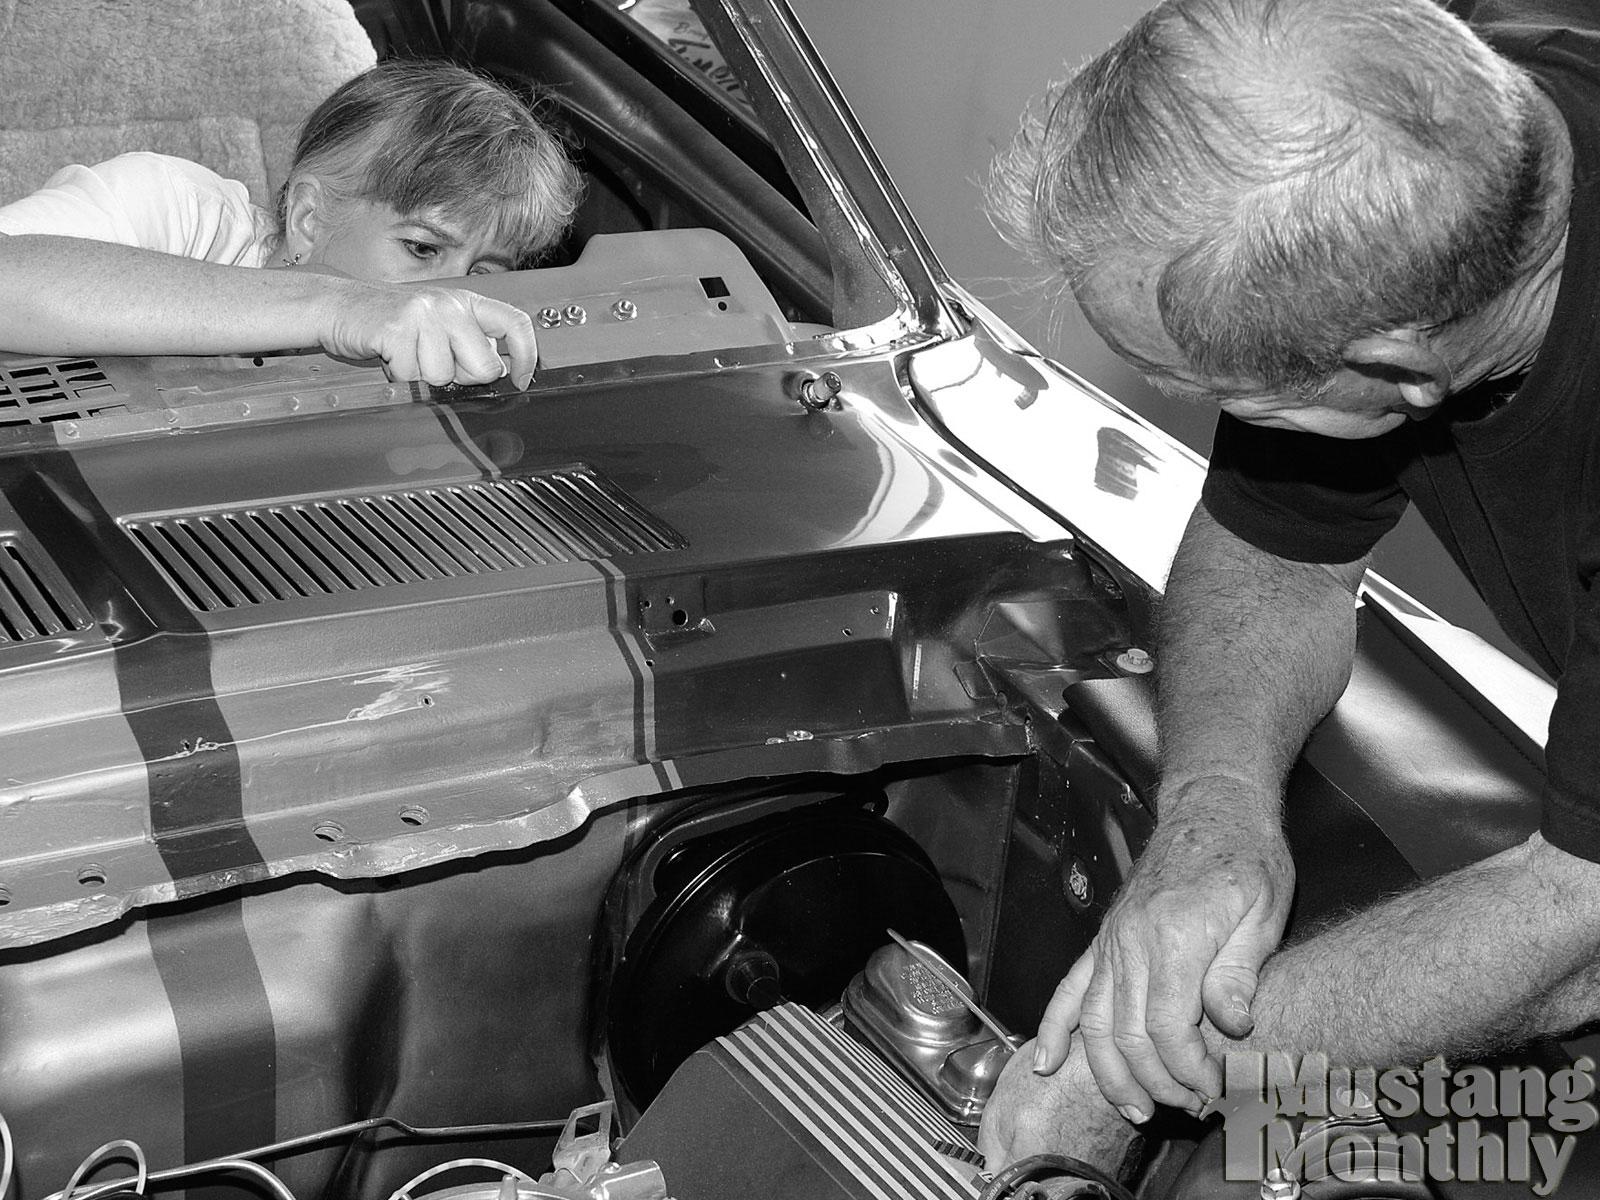 Mump 0308 08  Install Power Brake Booster  Install Power Booster